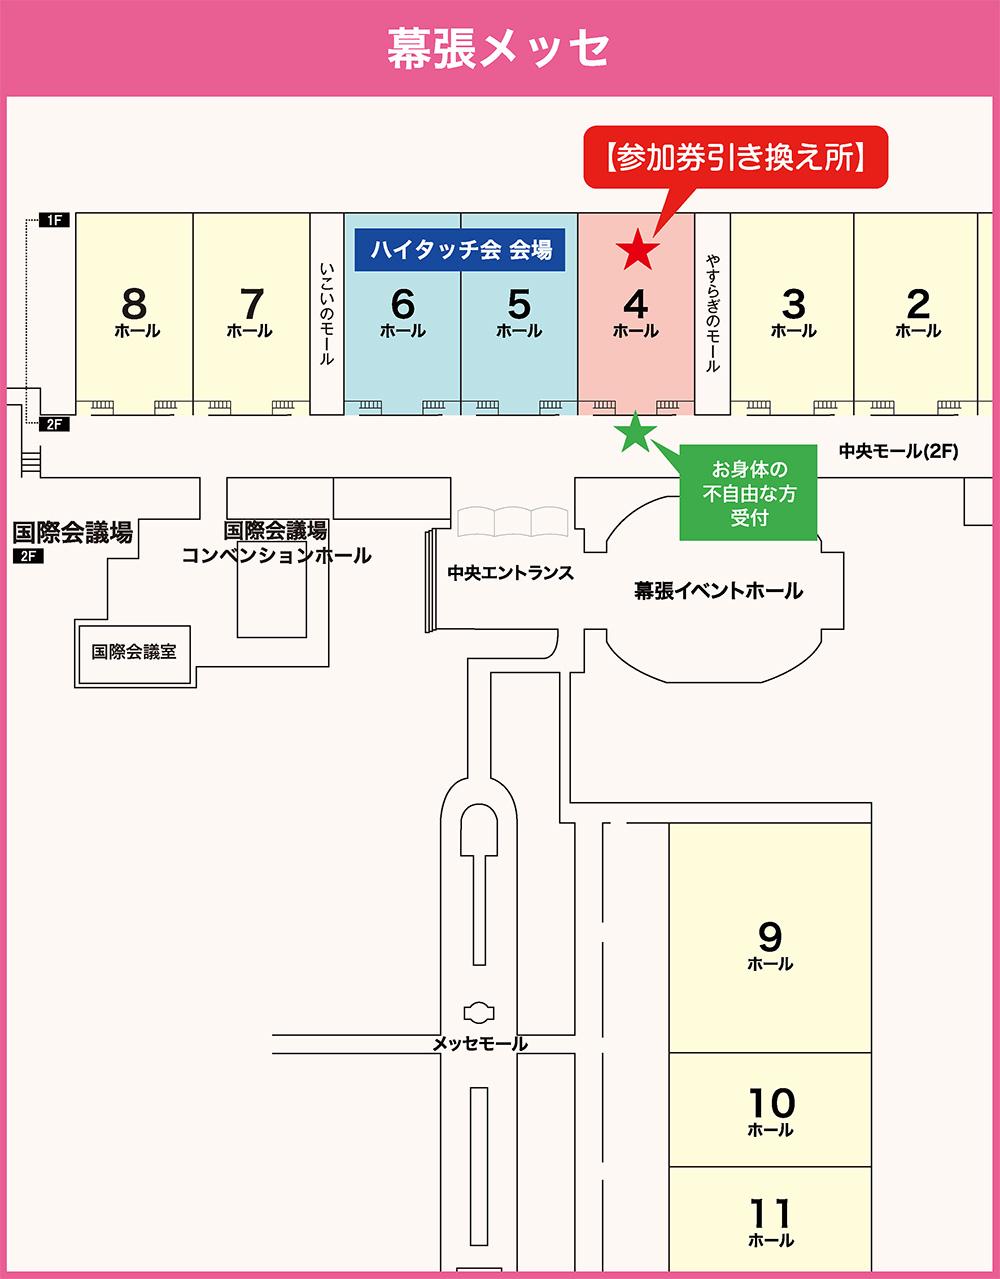 twice ハイタッチ 会 登録